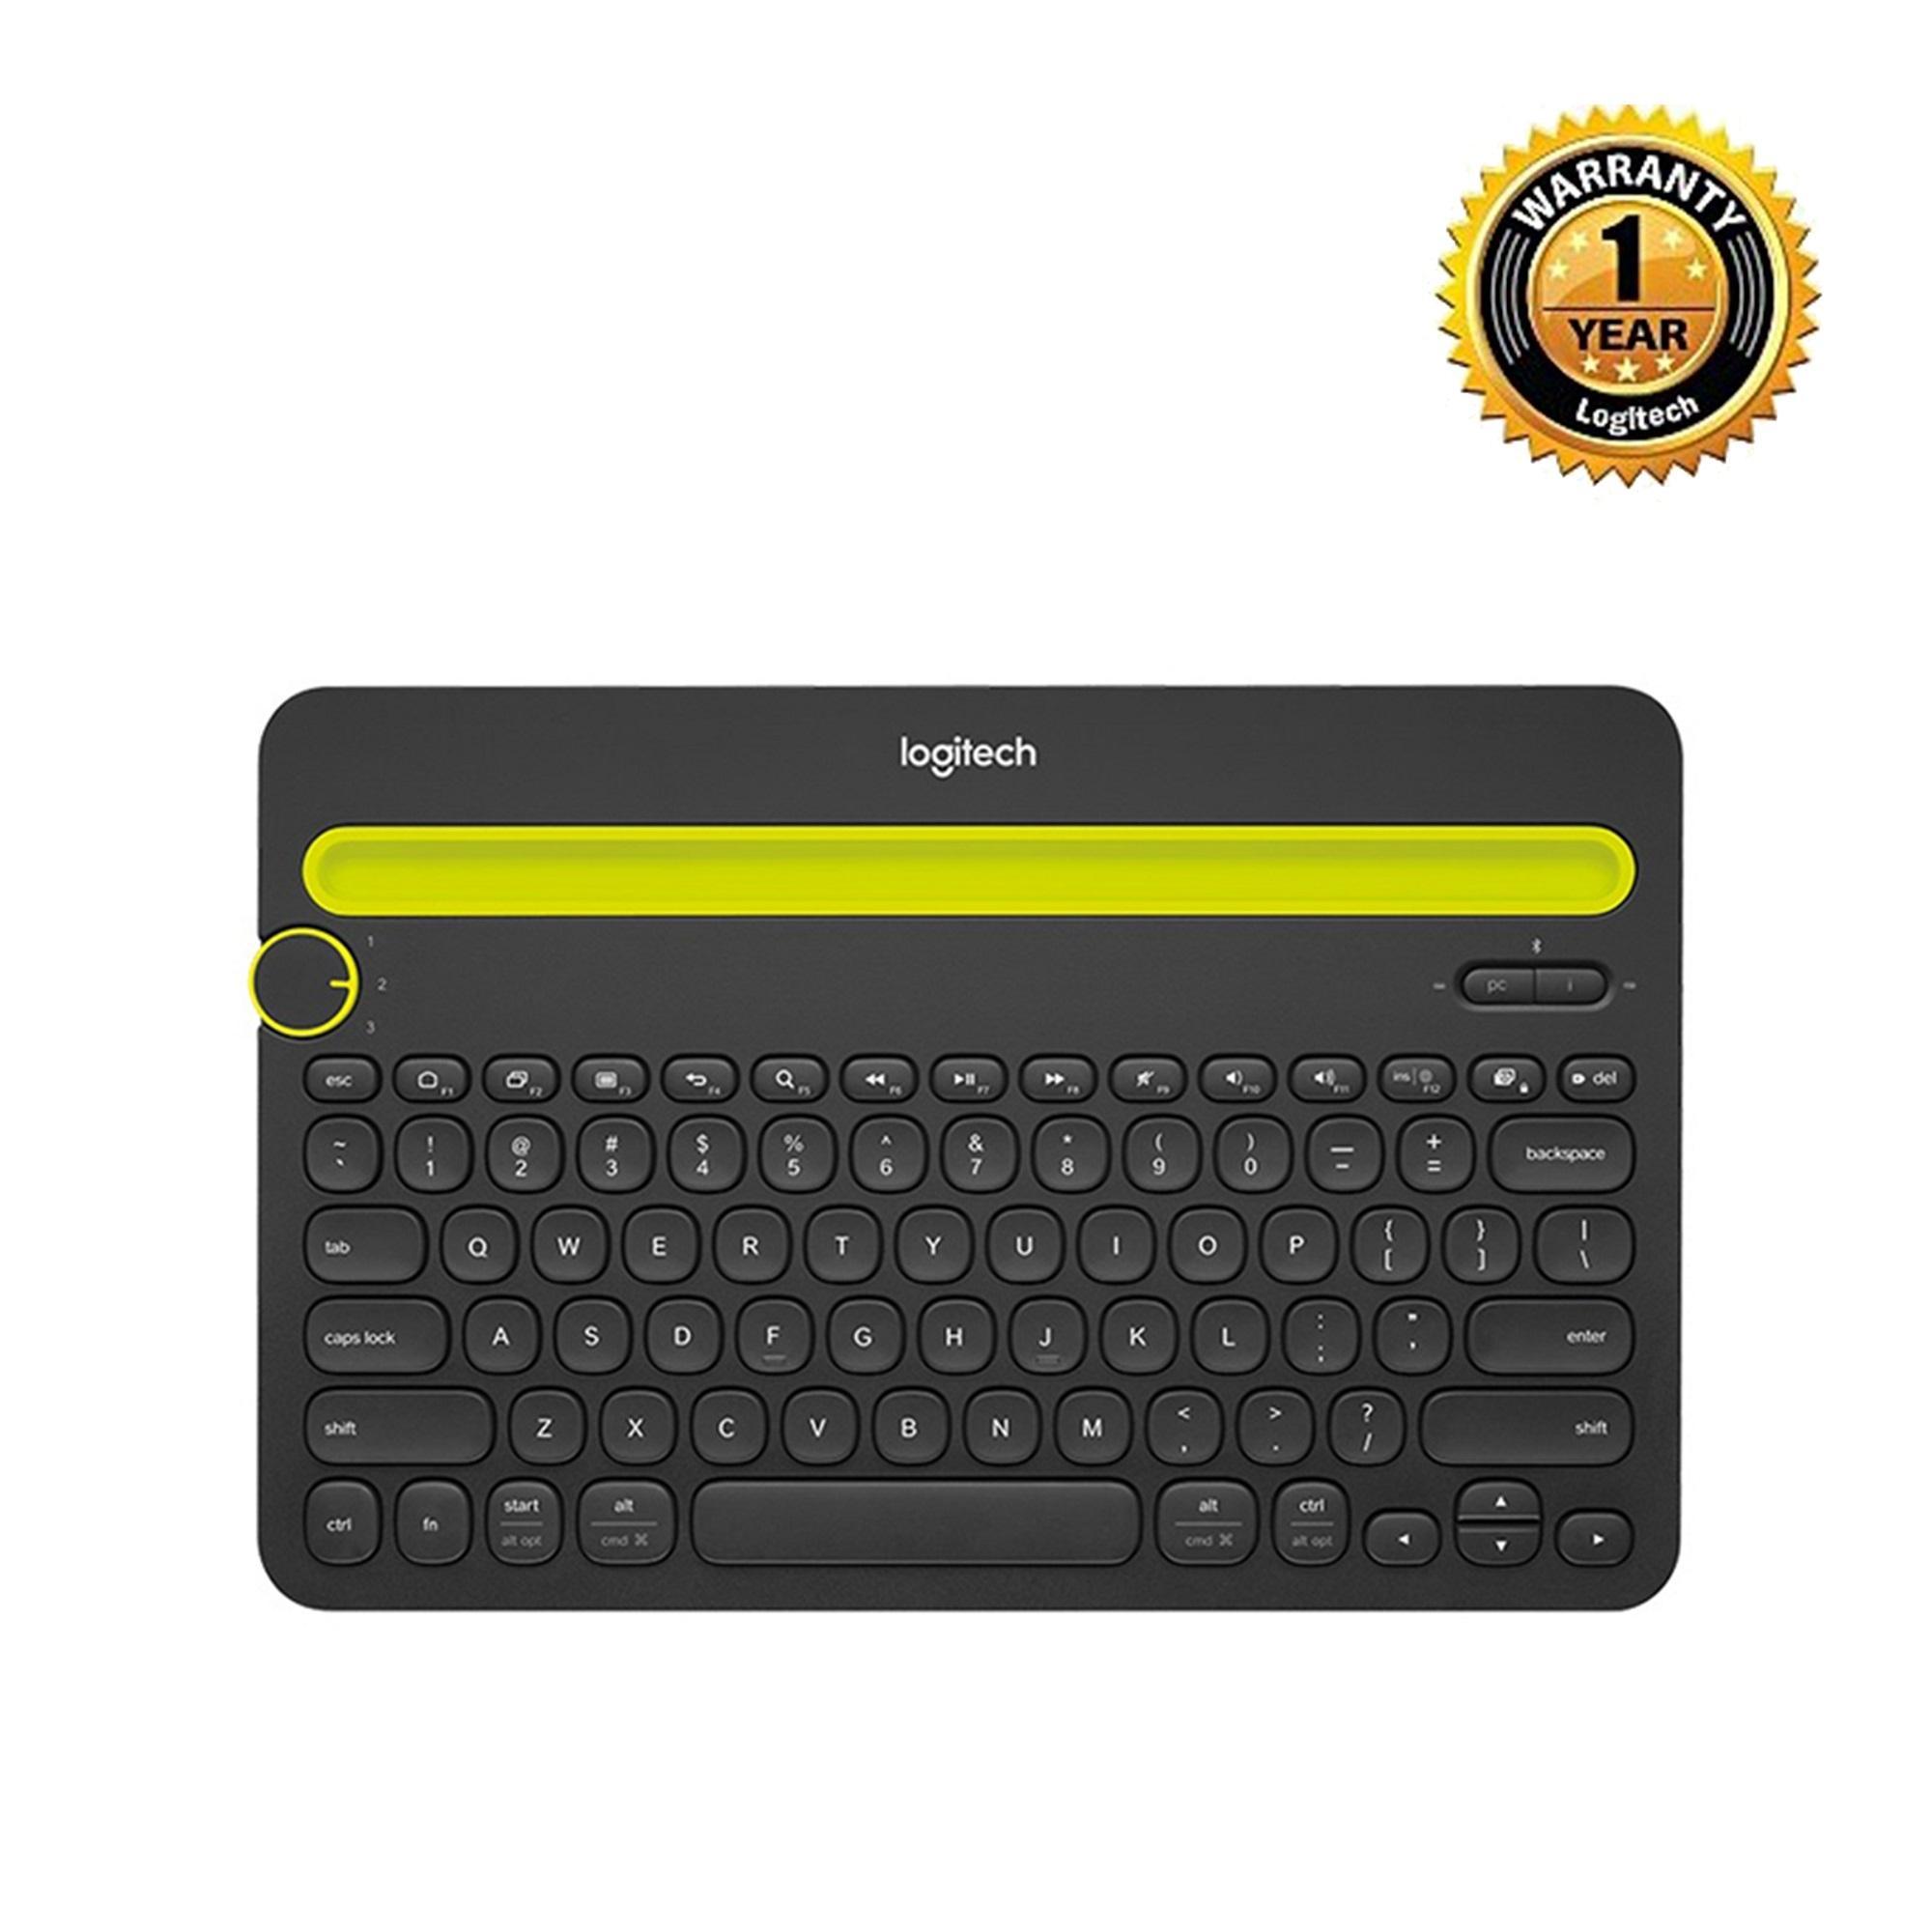 Buy Logitech Keyboards At Best Prices Online In Bangladesh Daraz Mk220 Keyboard Mouse Wireless Combo Original K480 Bluetooth Multi Device Black